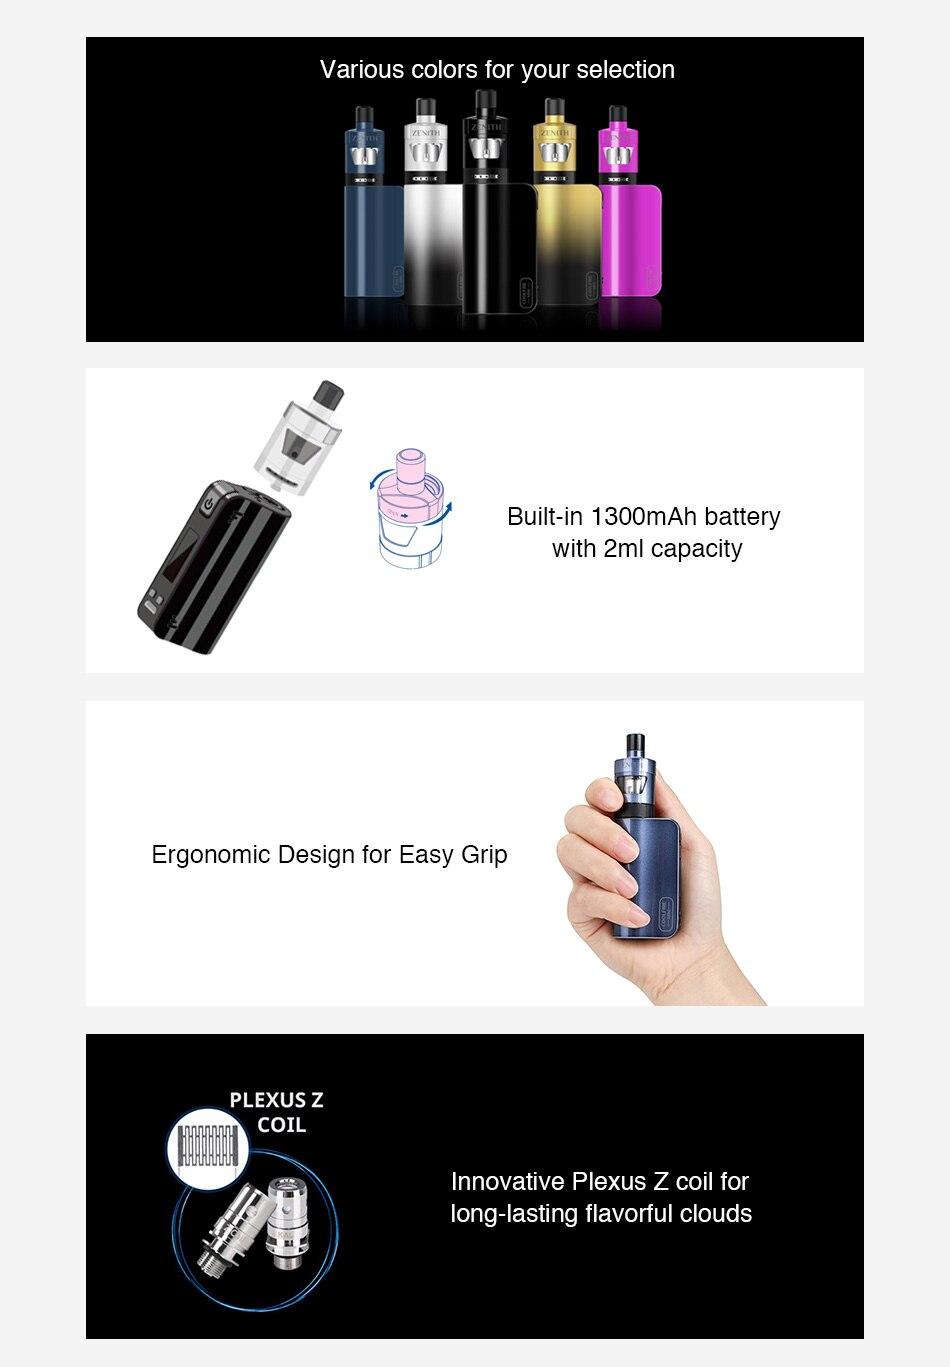 Innokin-CoolFire-Mini-Zenith-D22-Kit-1300mAh_04_a07b0a